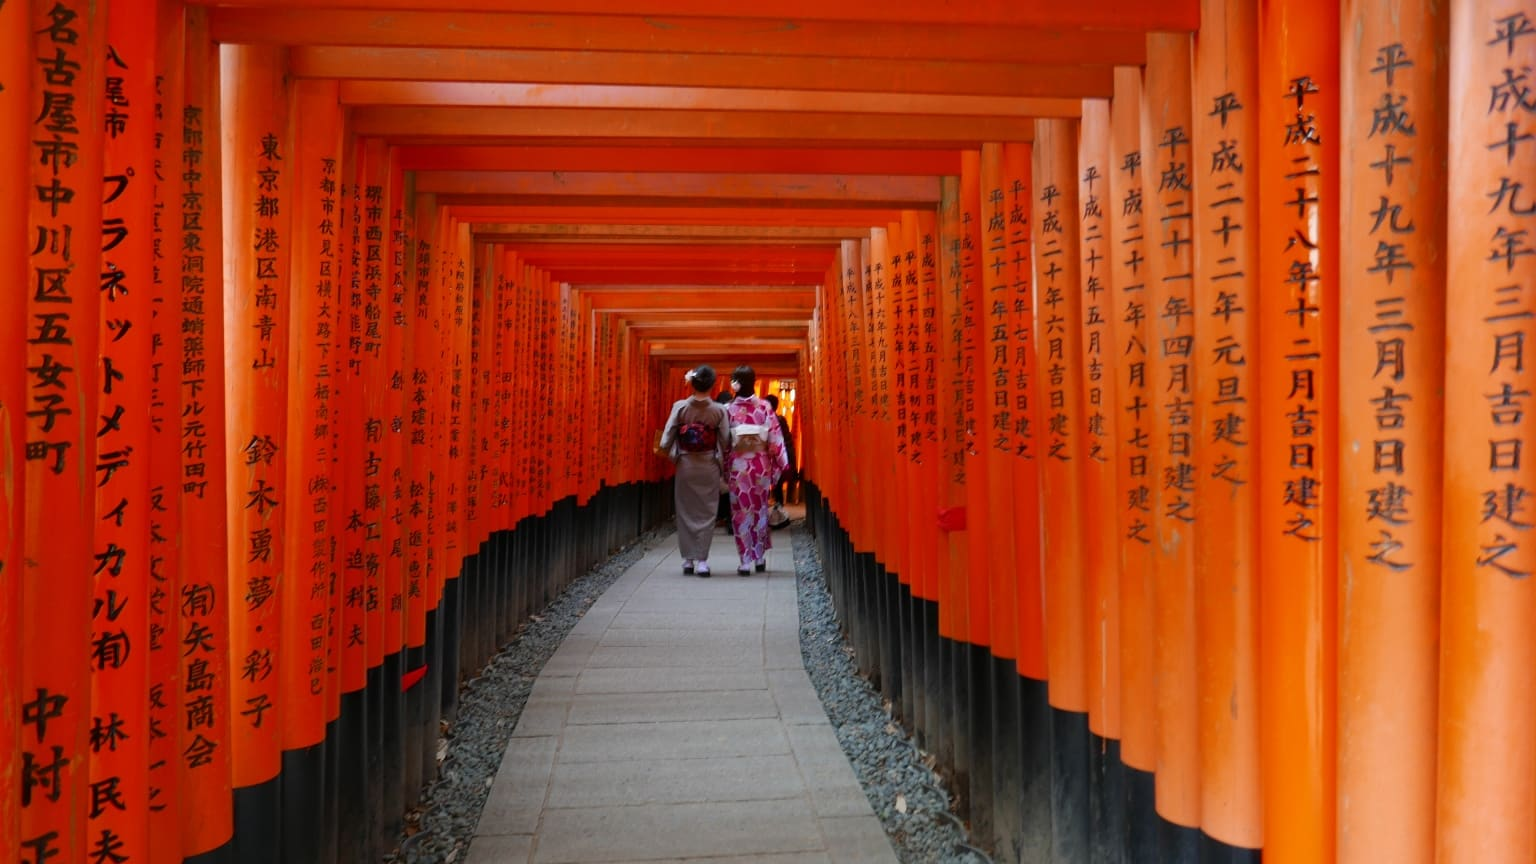 Start of the hike - through the torii gates of fushimi inari